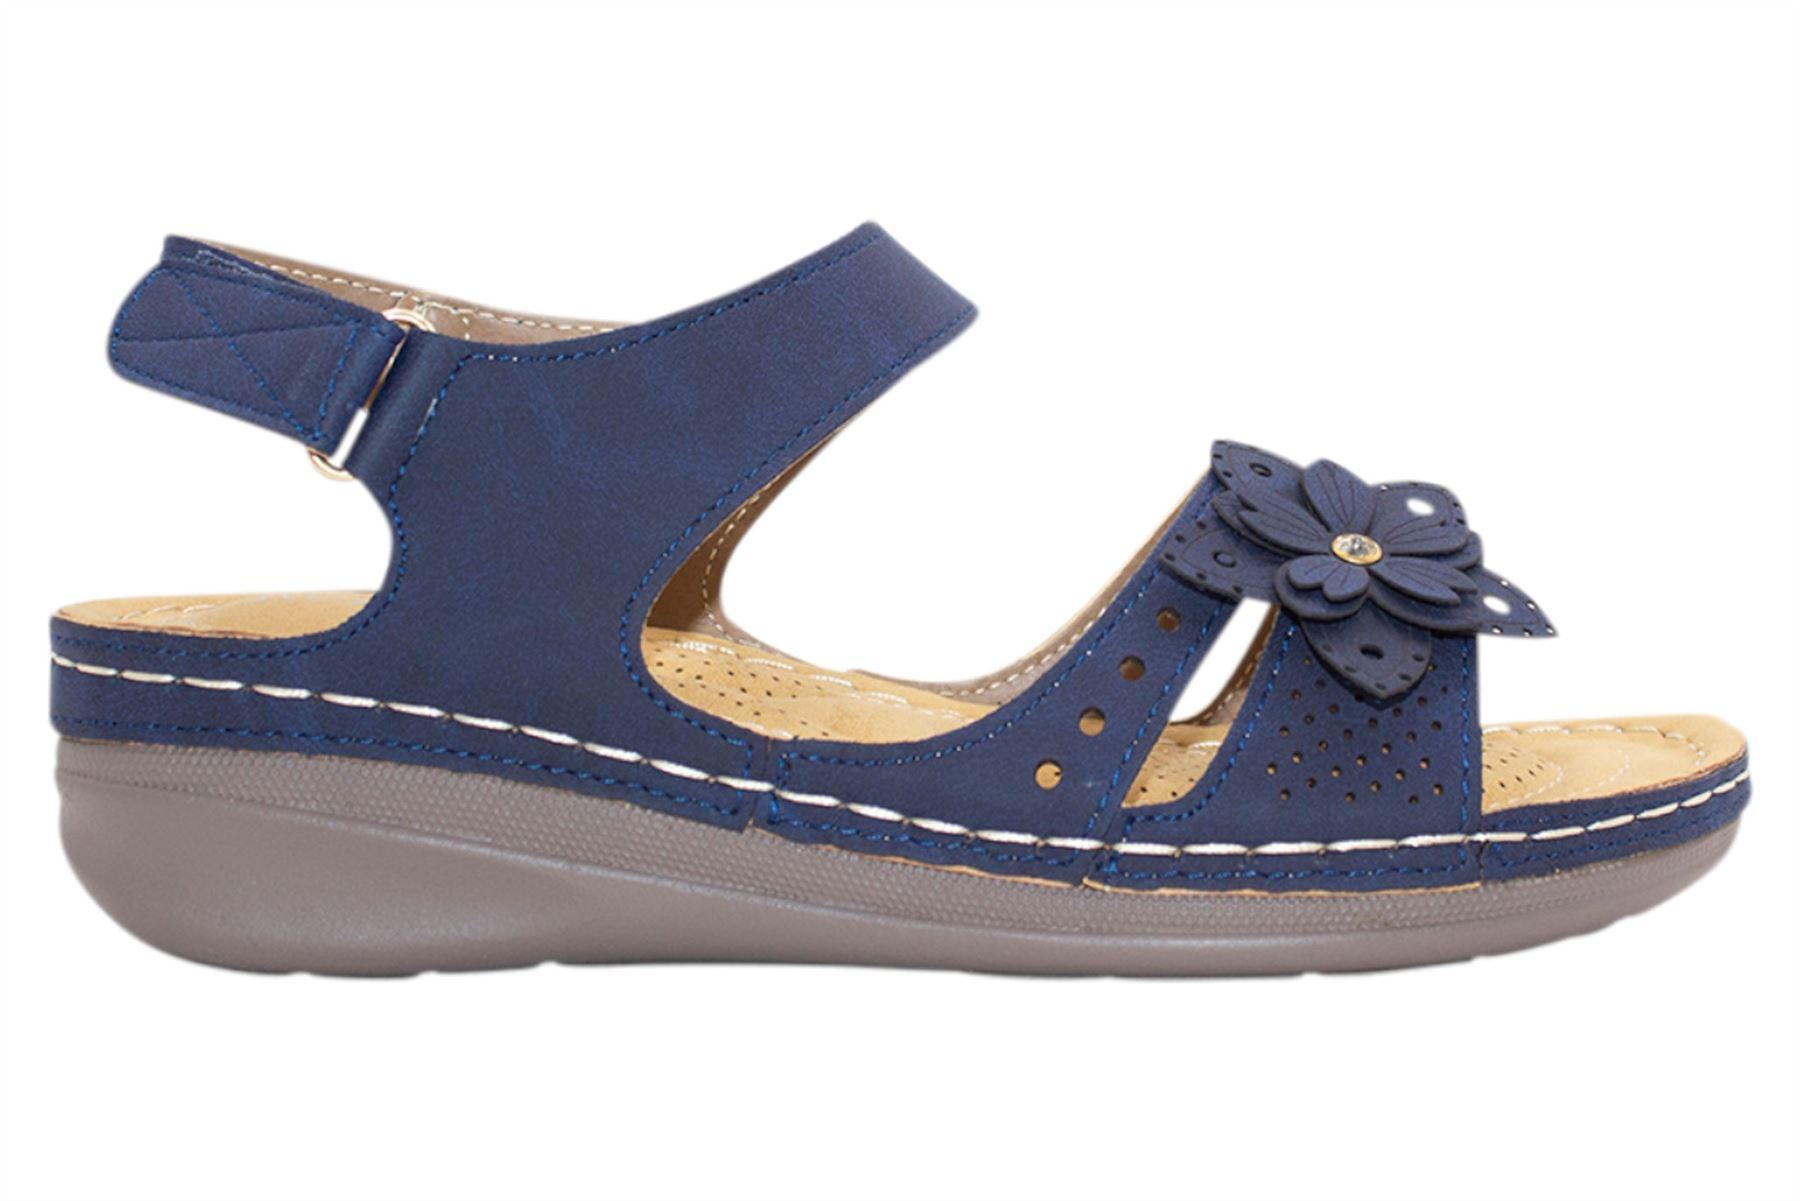 Ladies-Wedge-Heel-Sandal-Womens-Comfort-Cushion-Strapy-Summer-Shoes miniatura 36